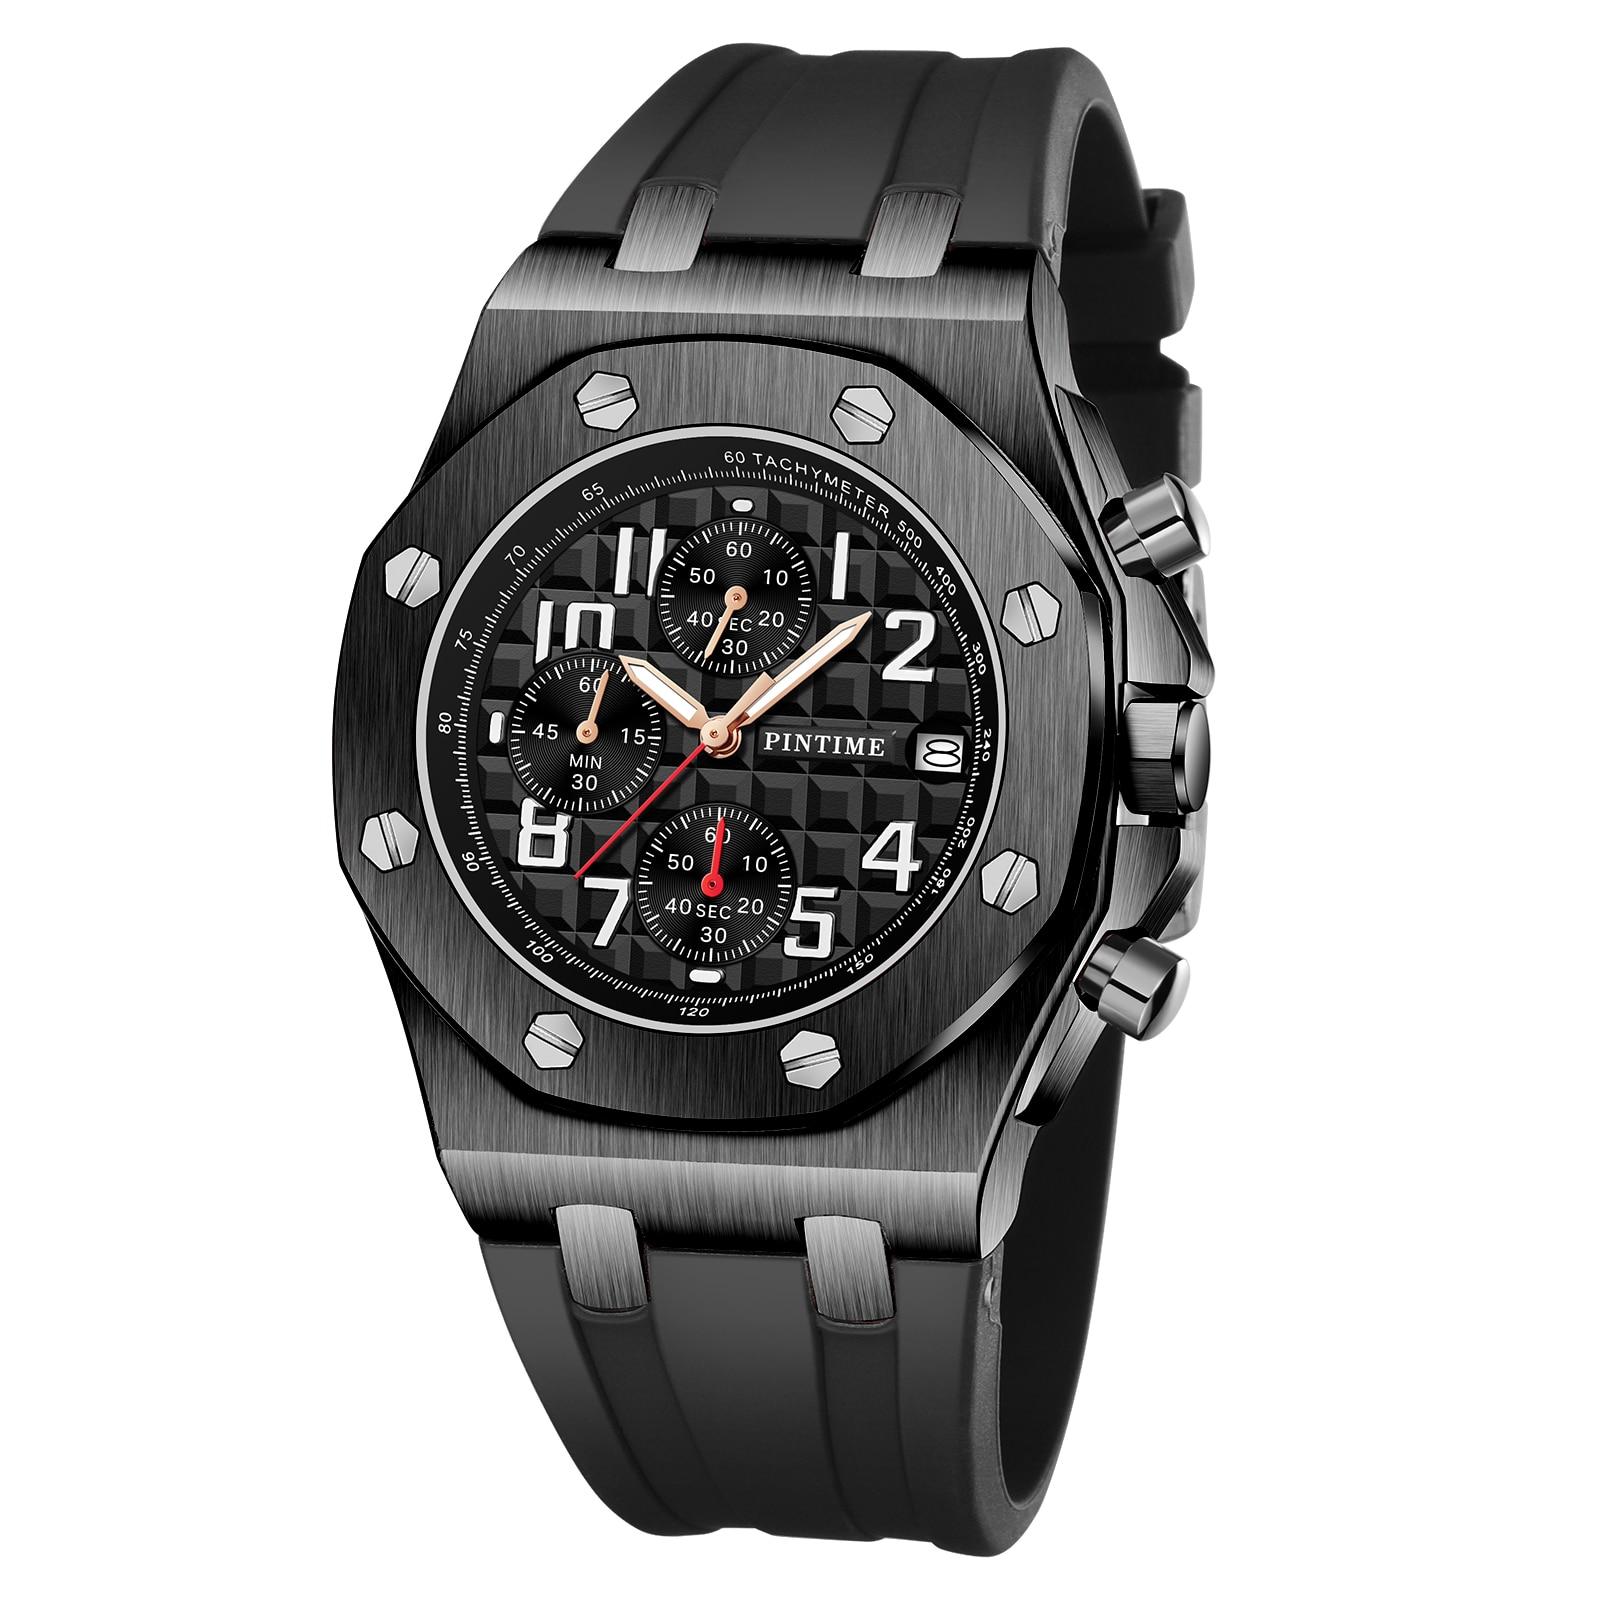 PINTIME Mens Watches Top Brand Luxury Military Sport Watch Men Waterproof Quartz Date Wristwatch Relogio Masculino Reloj Hombre